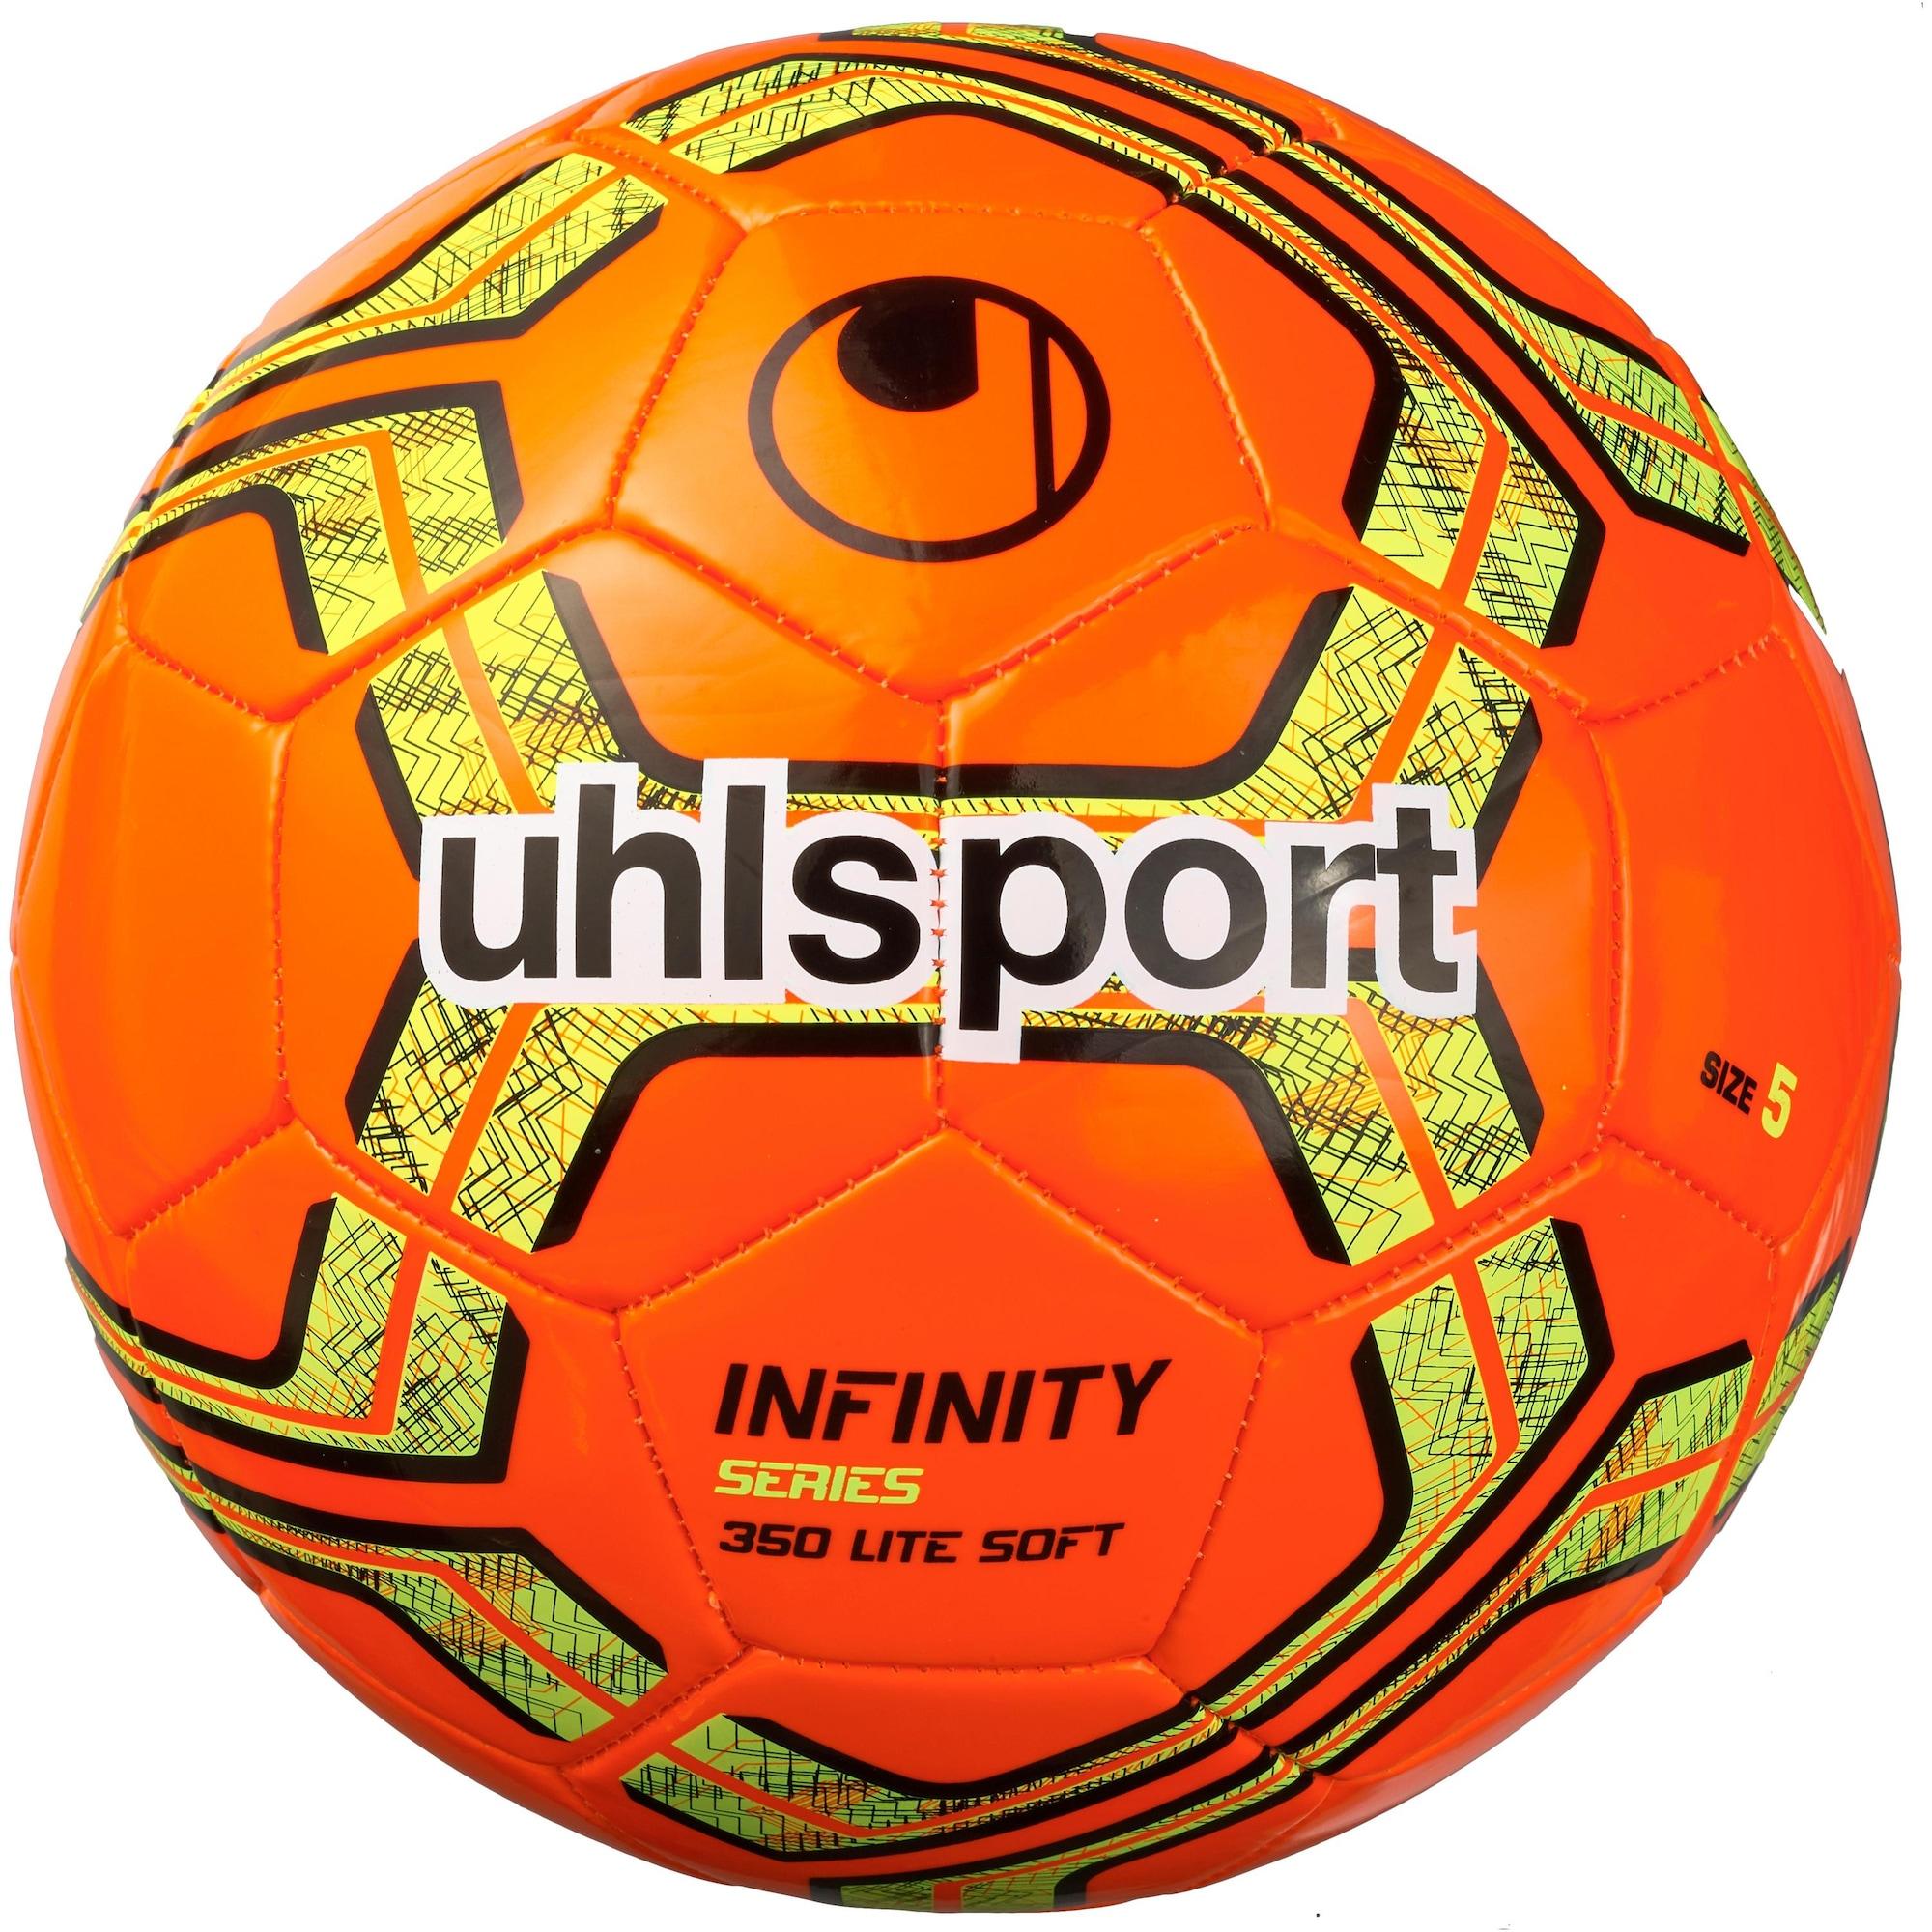 ´INFINITY 350 LITE SOFT´ Fußball